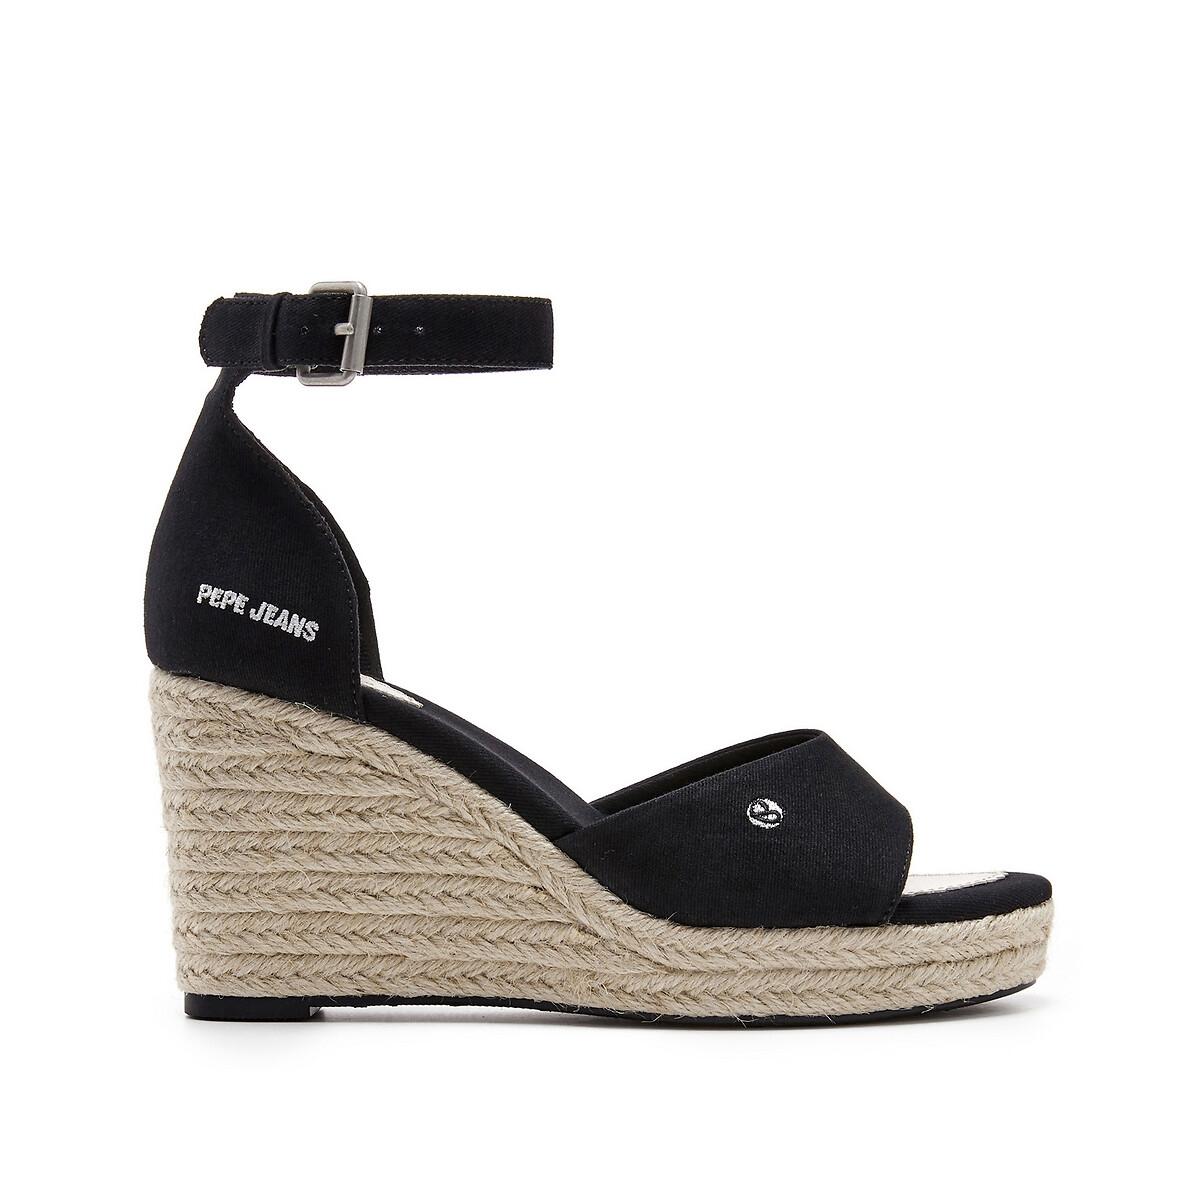 Women's Footwear Maida Bass Canvas Wedge Heel Sandals